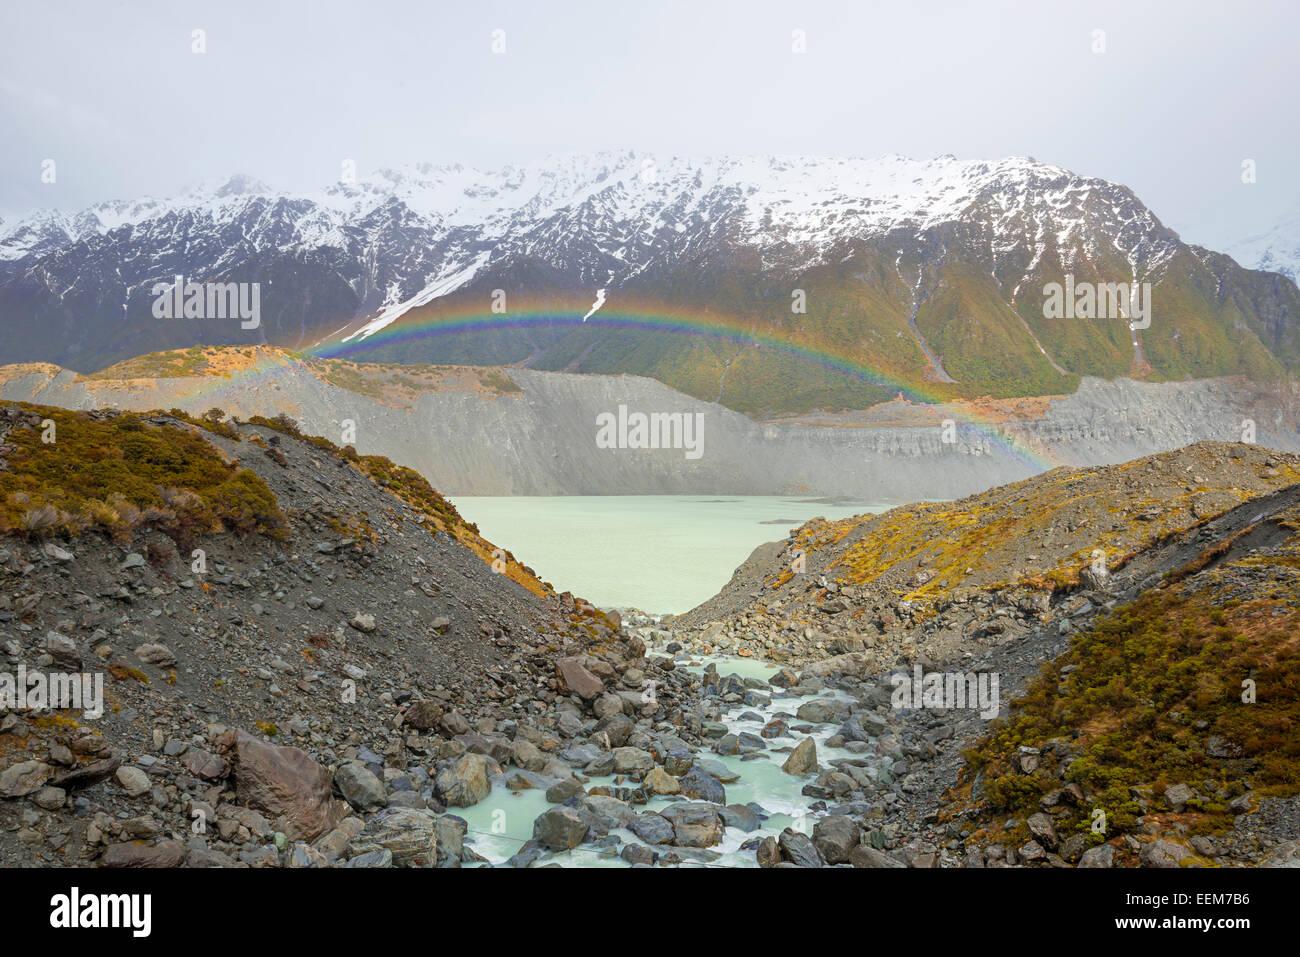 New Zealand, Canterbury region, Rainbow over Mueller Glacier Lake - Stock Image